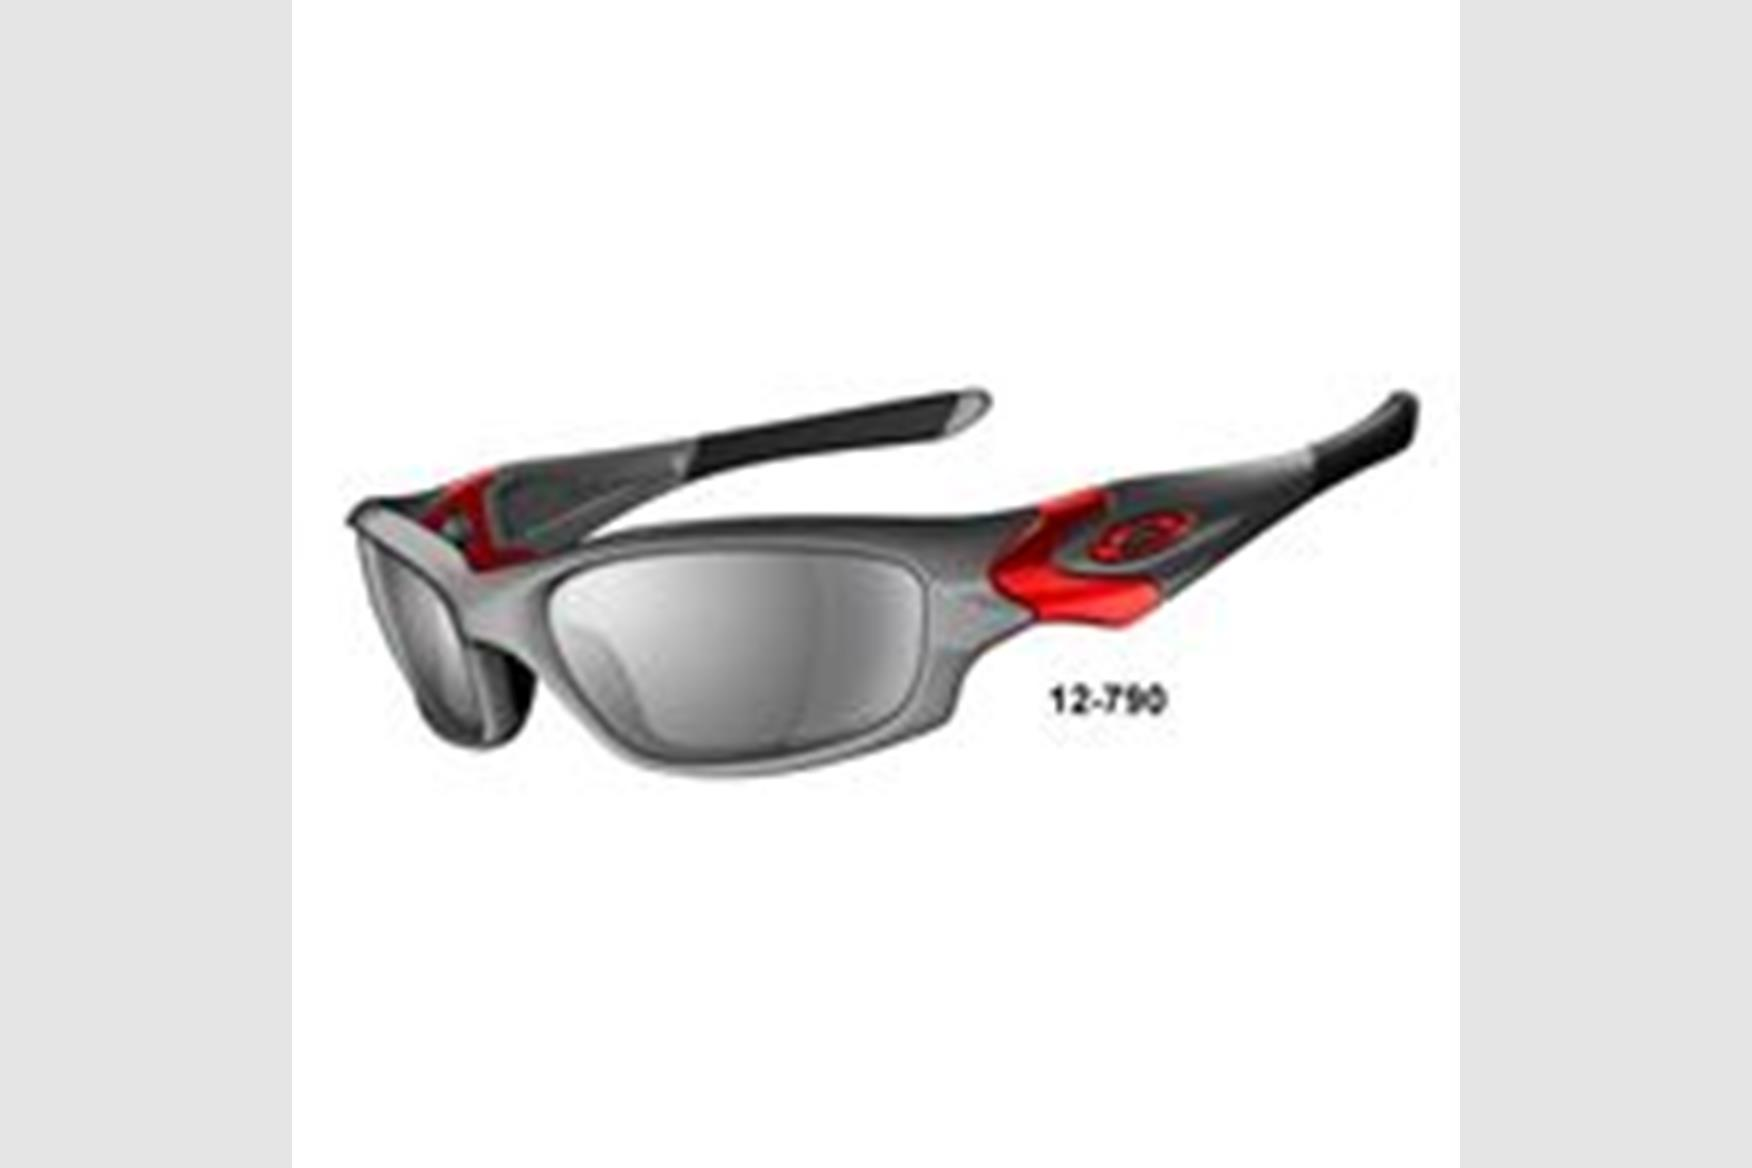 oakley prescription frames review wro0  Oakley Ducati Straight Jacket Sunglasses Review